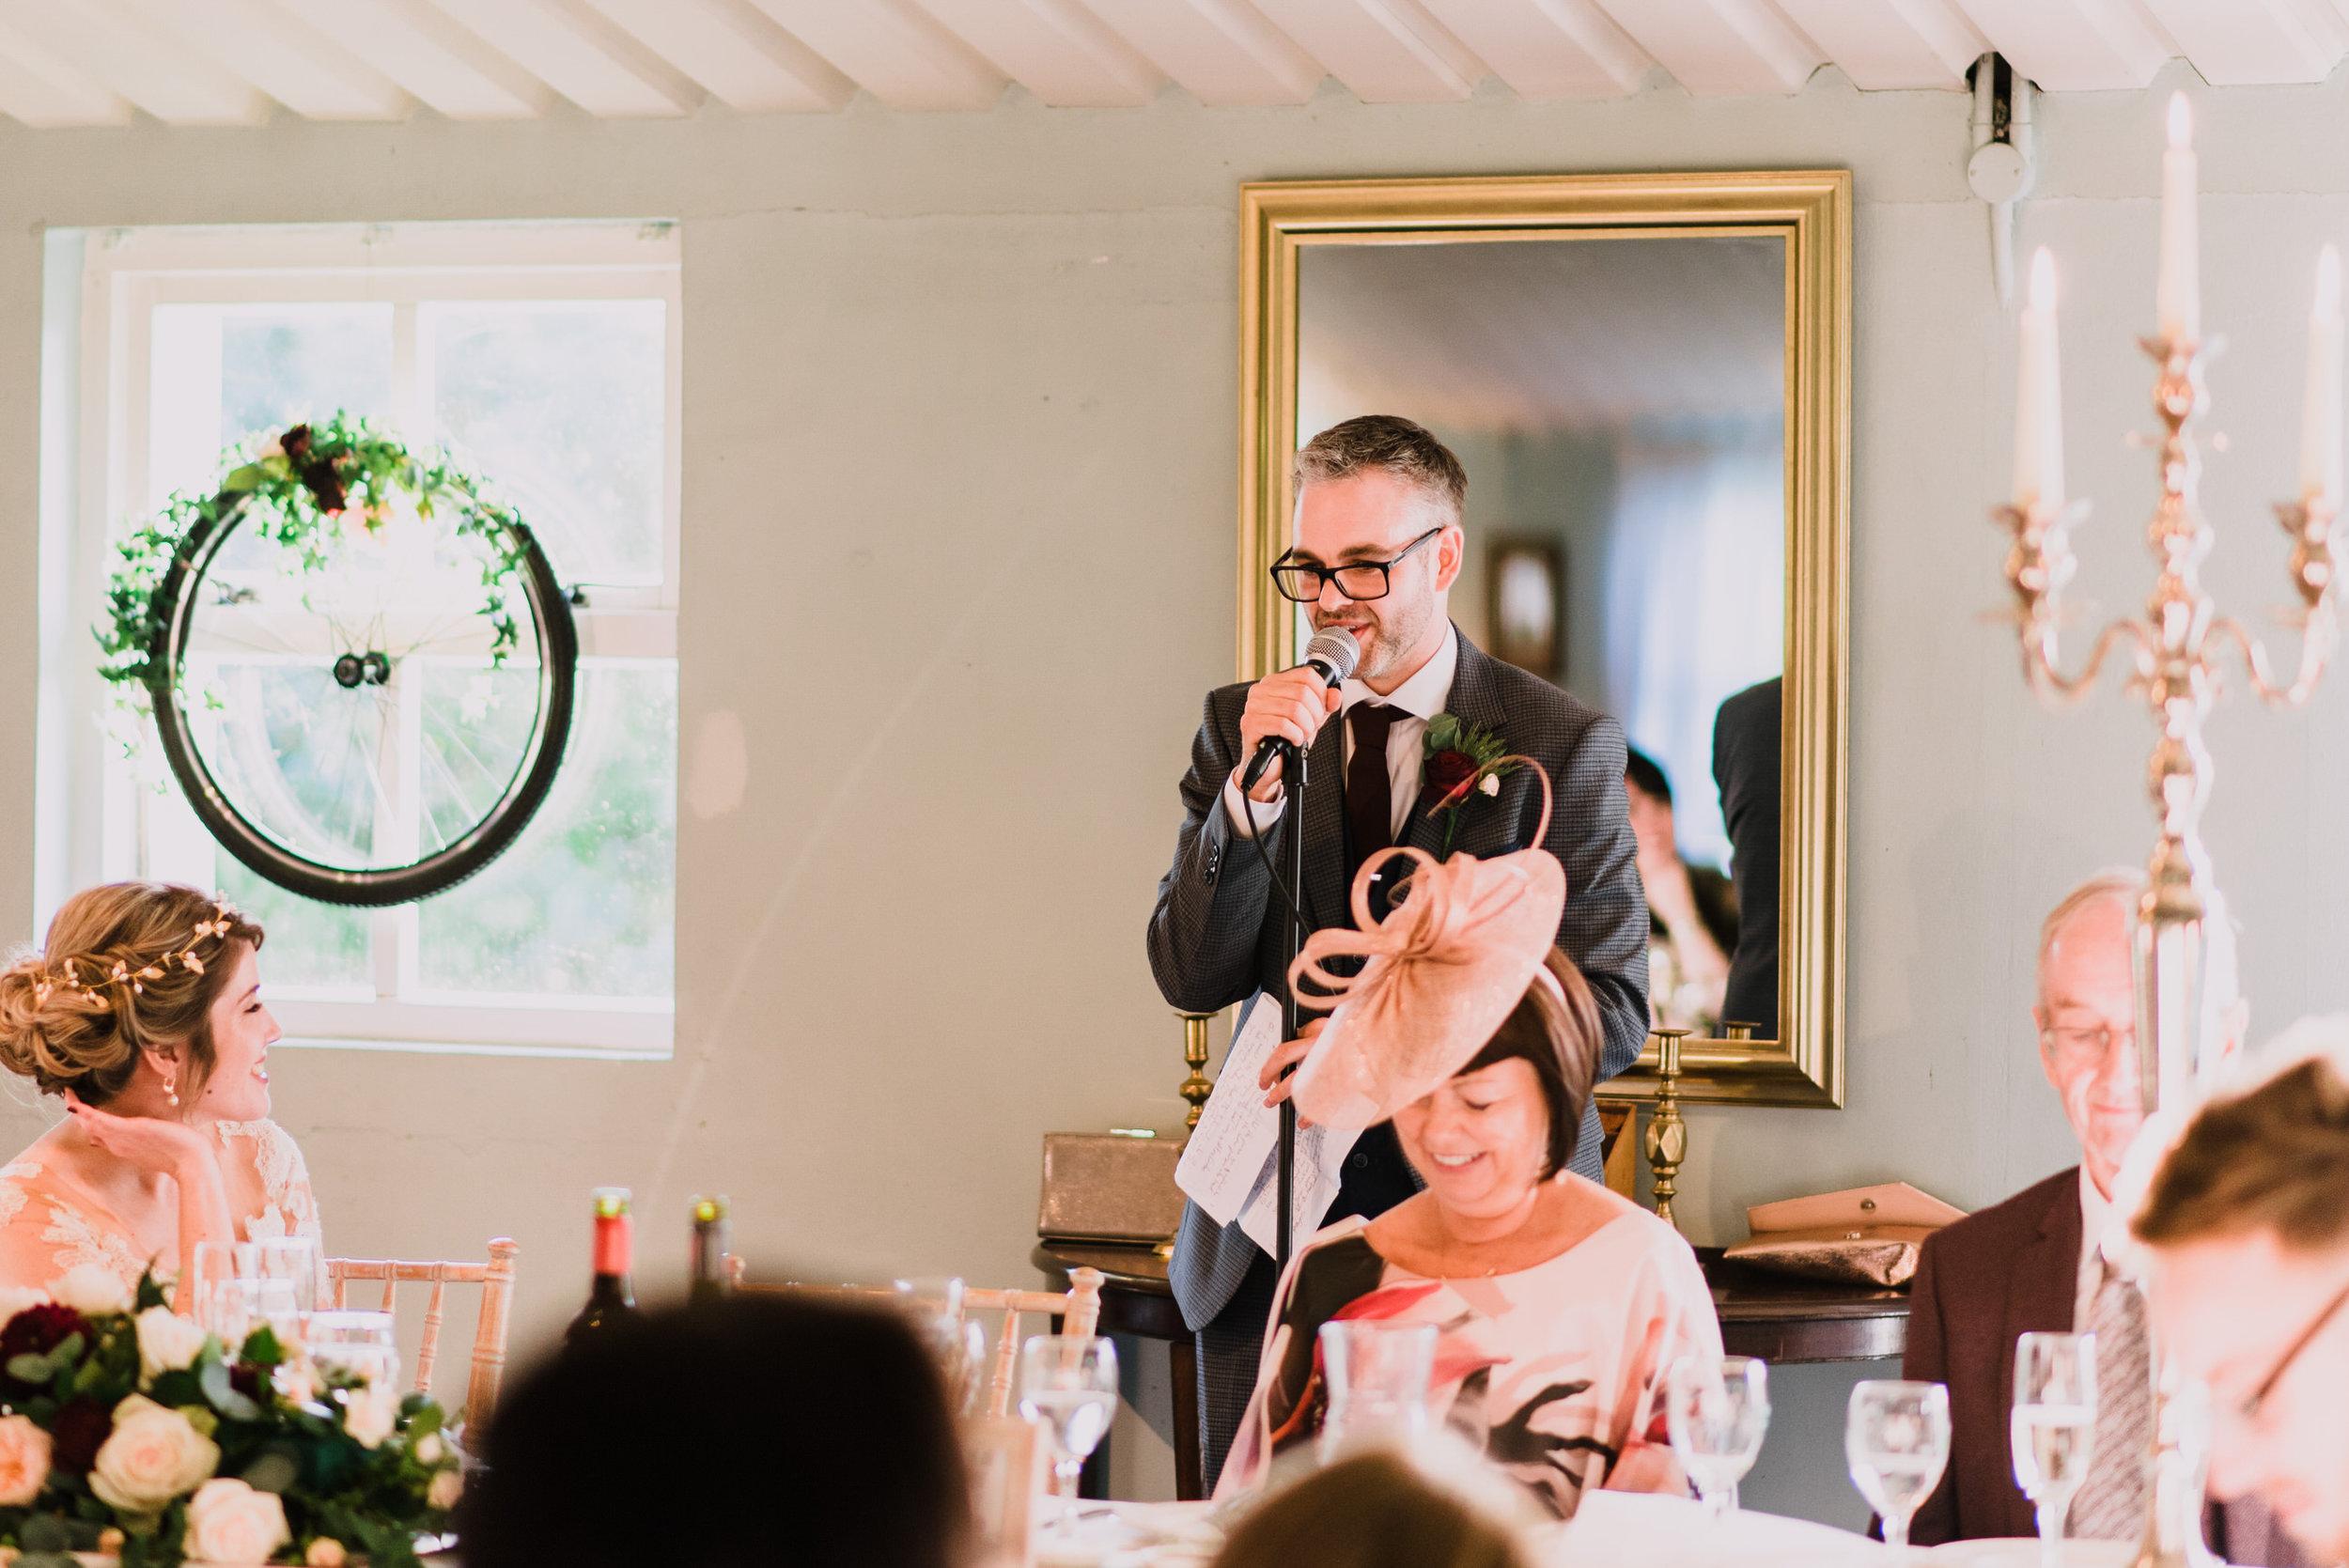 lissanoure castle wedding, northern ireland wedding photographer, romantic northern irish wedding venue, castle wedding ireland, natural wedding photography ni (117).jpg